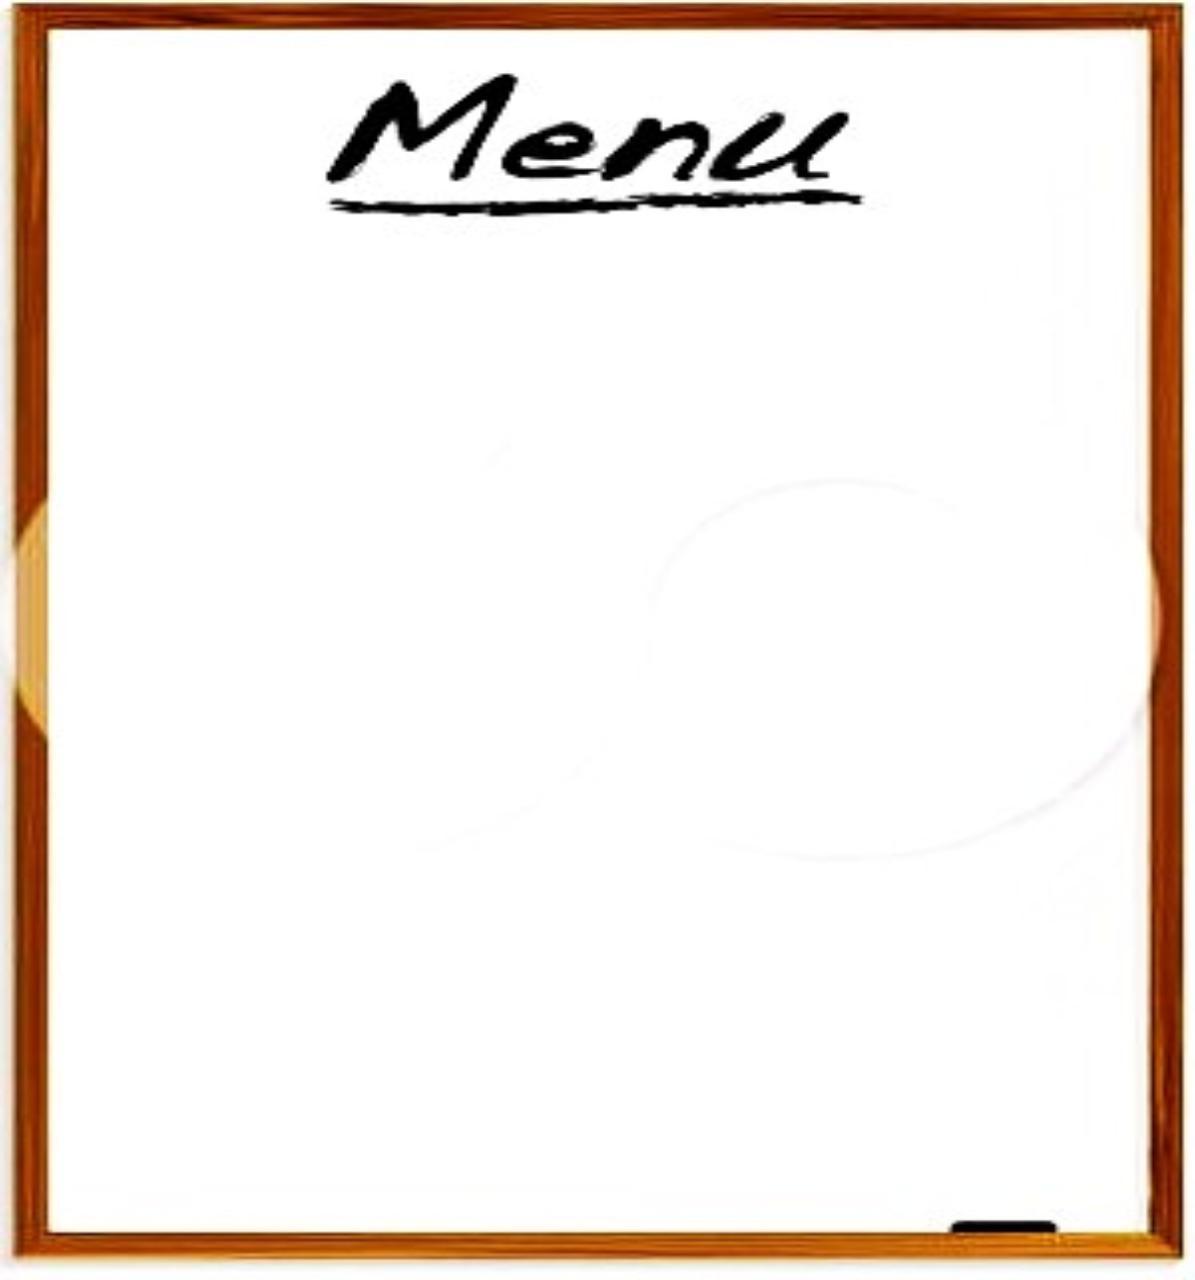 picture Menu clipart. Free cliparts download clip.